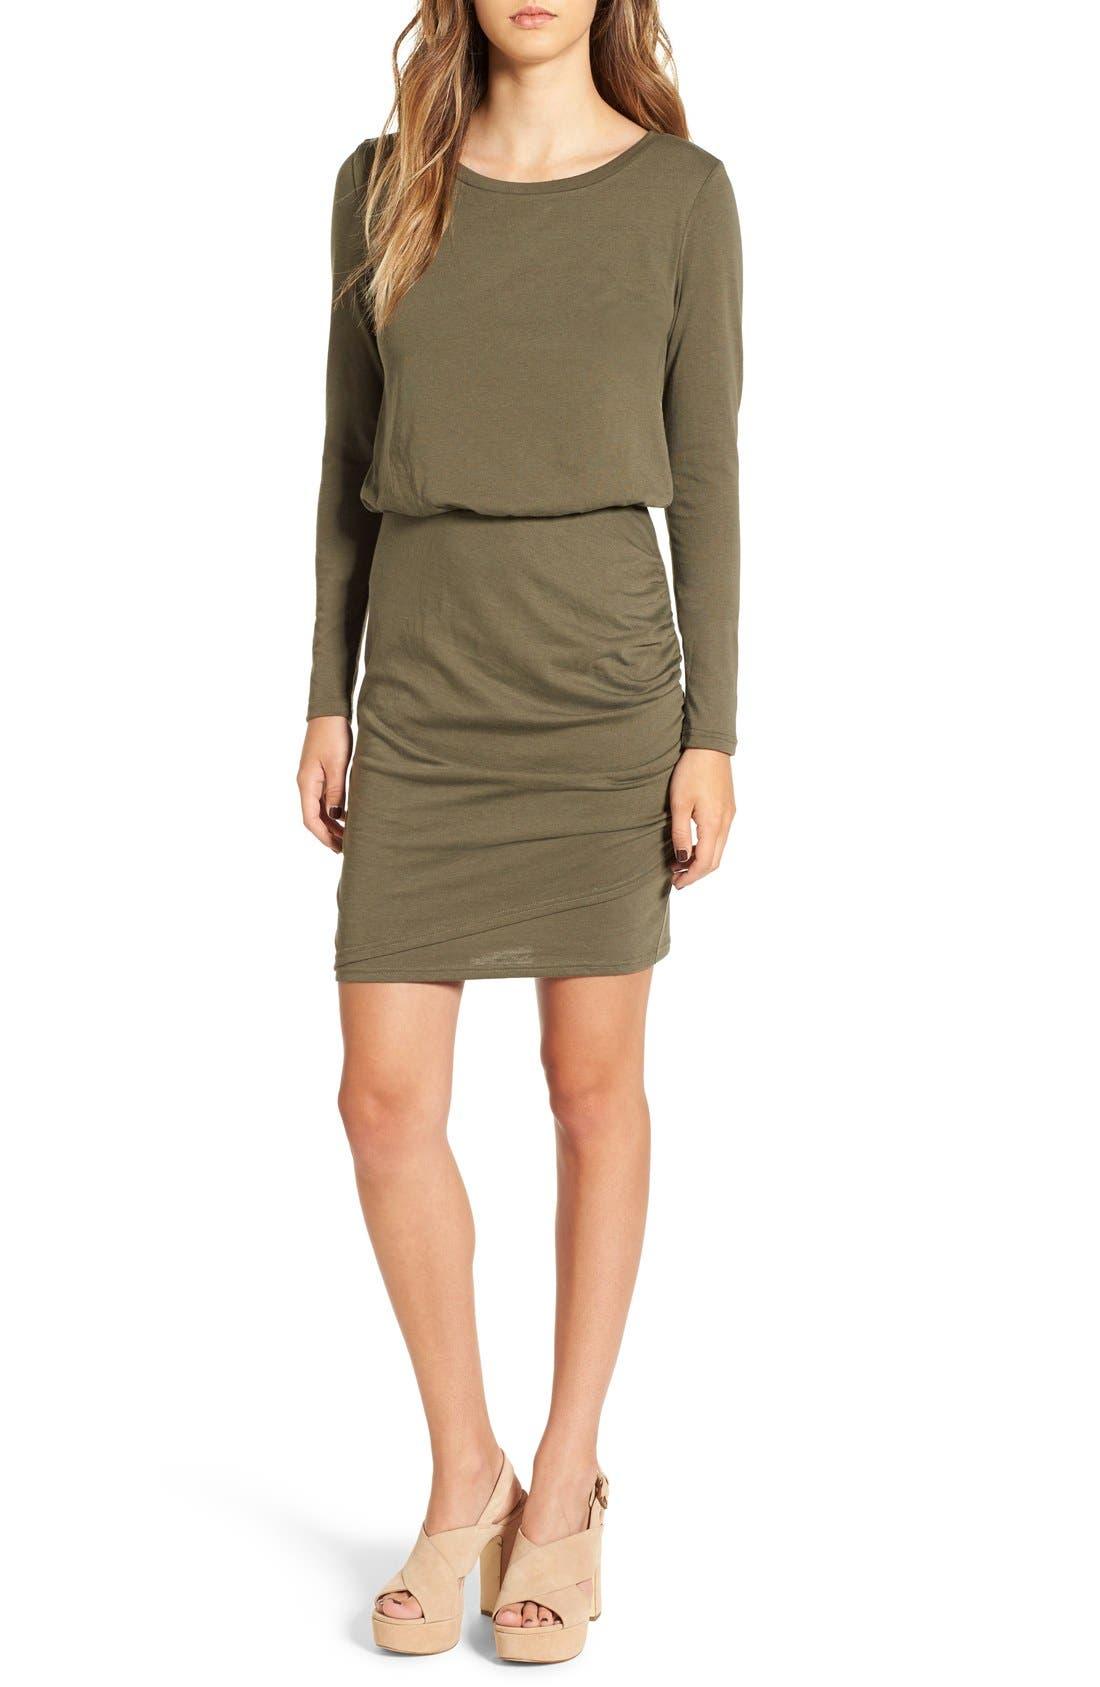 Alternate Image 1 Selected - Leith Blouson Body-Con Dress